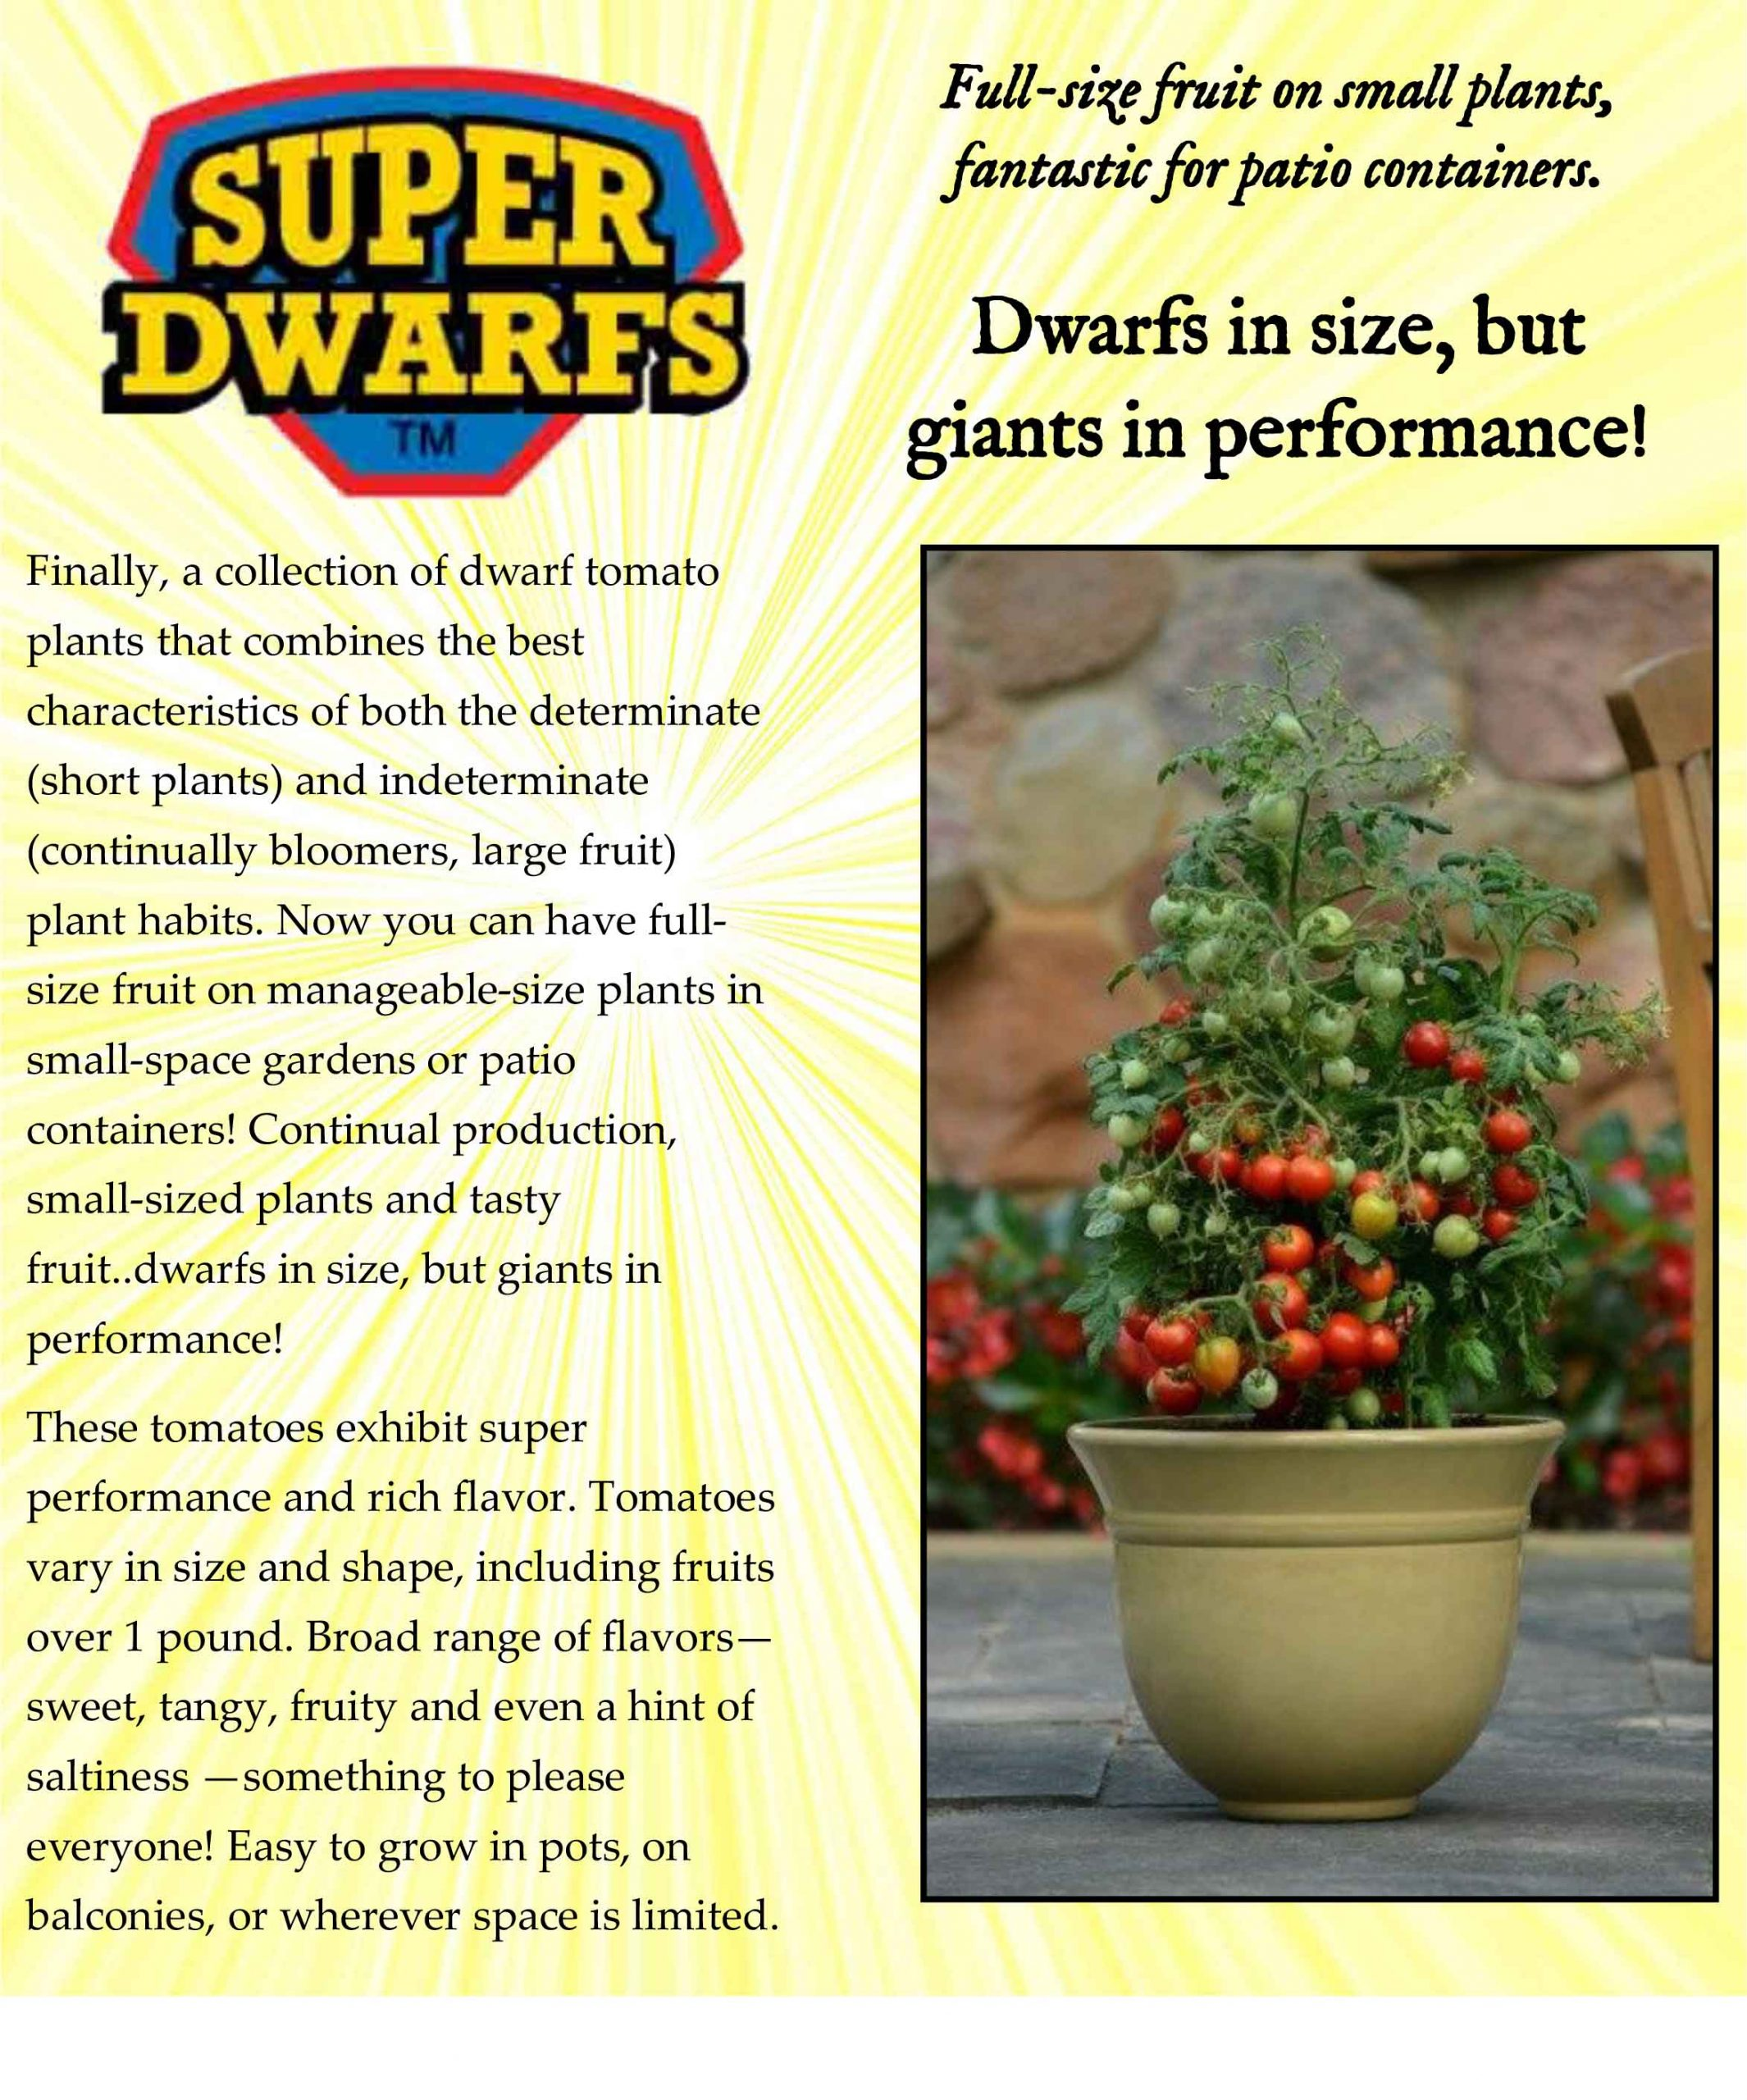 Super-dwarfs-patio-tomatoes